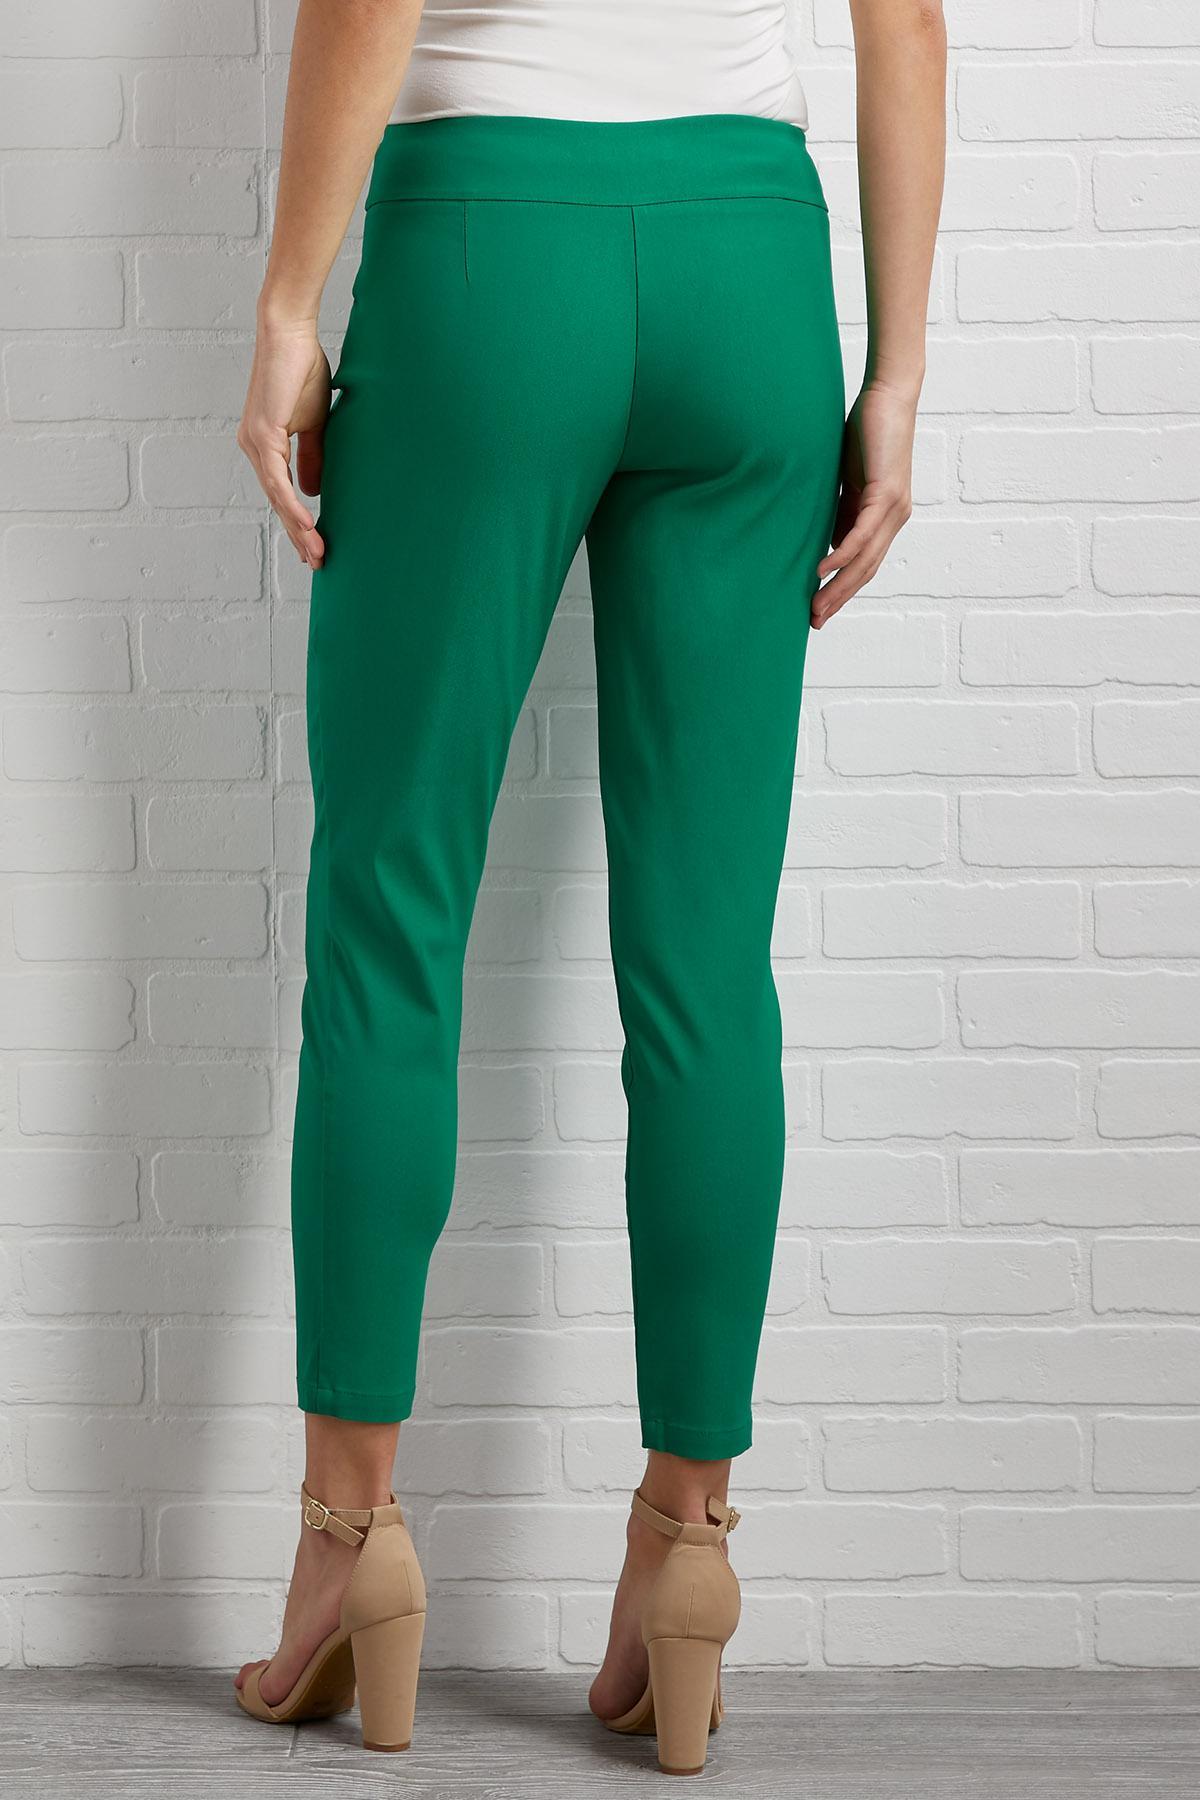 New Girl Pants